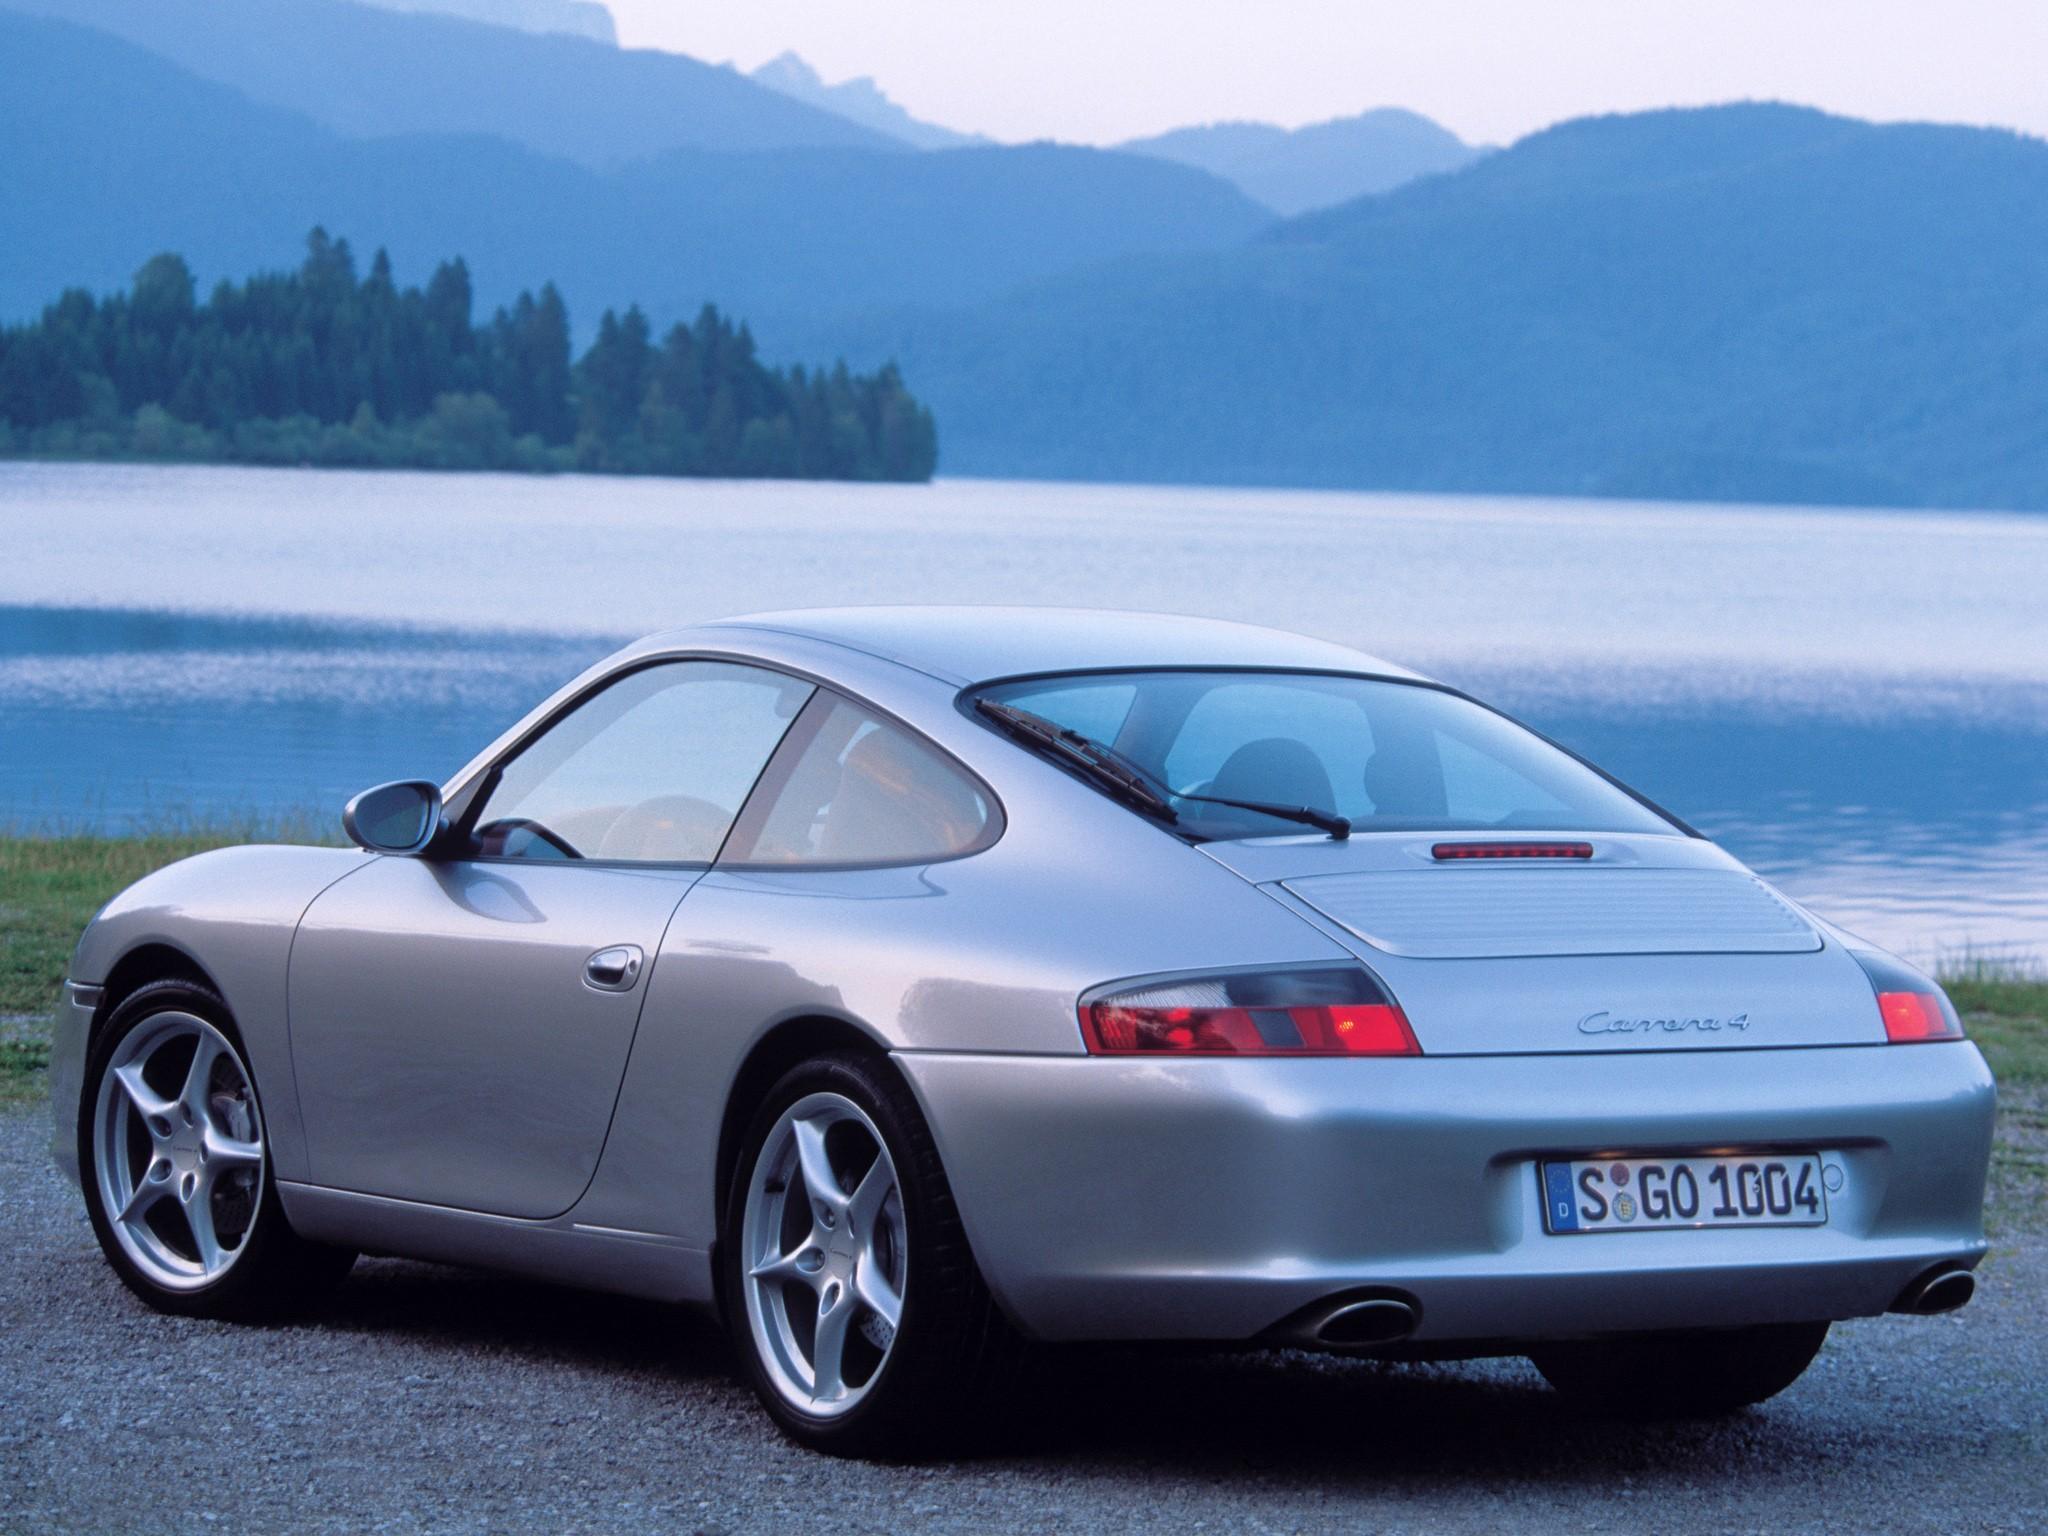 porsche 911 carrera 4 996 specs photos 2001 2002 2003 2004 2005 autoevolution. Black Bedroom Furniture Sets. Home Design Ideas